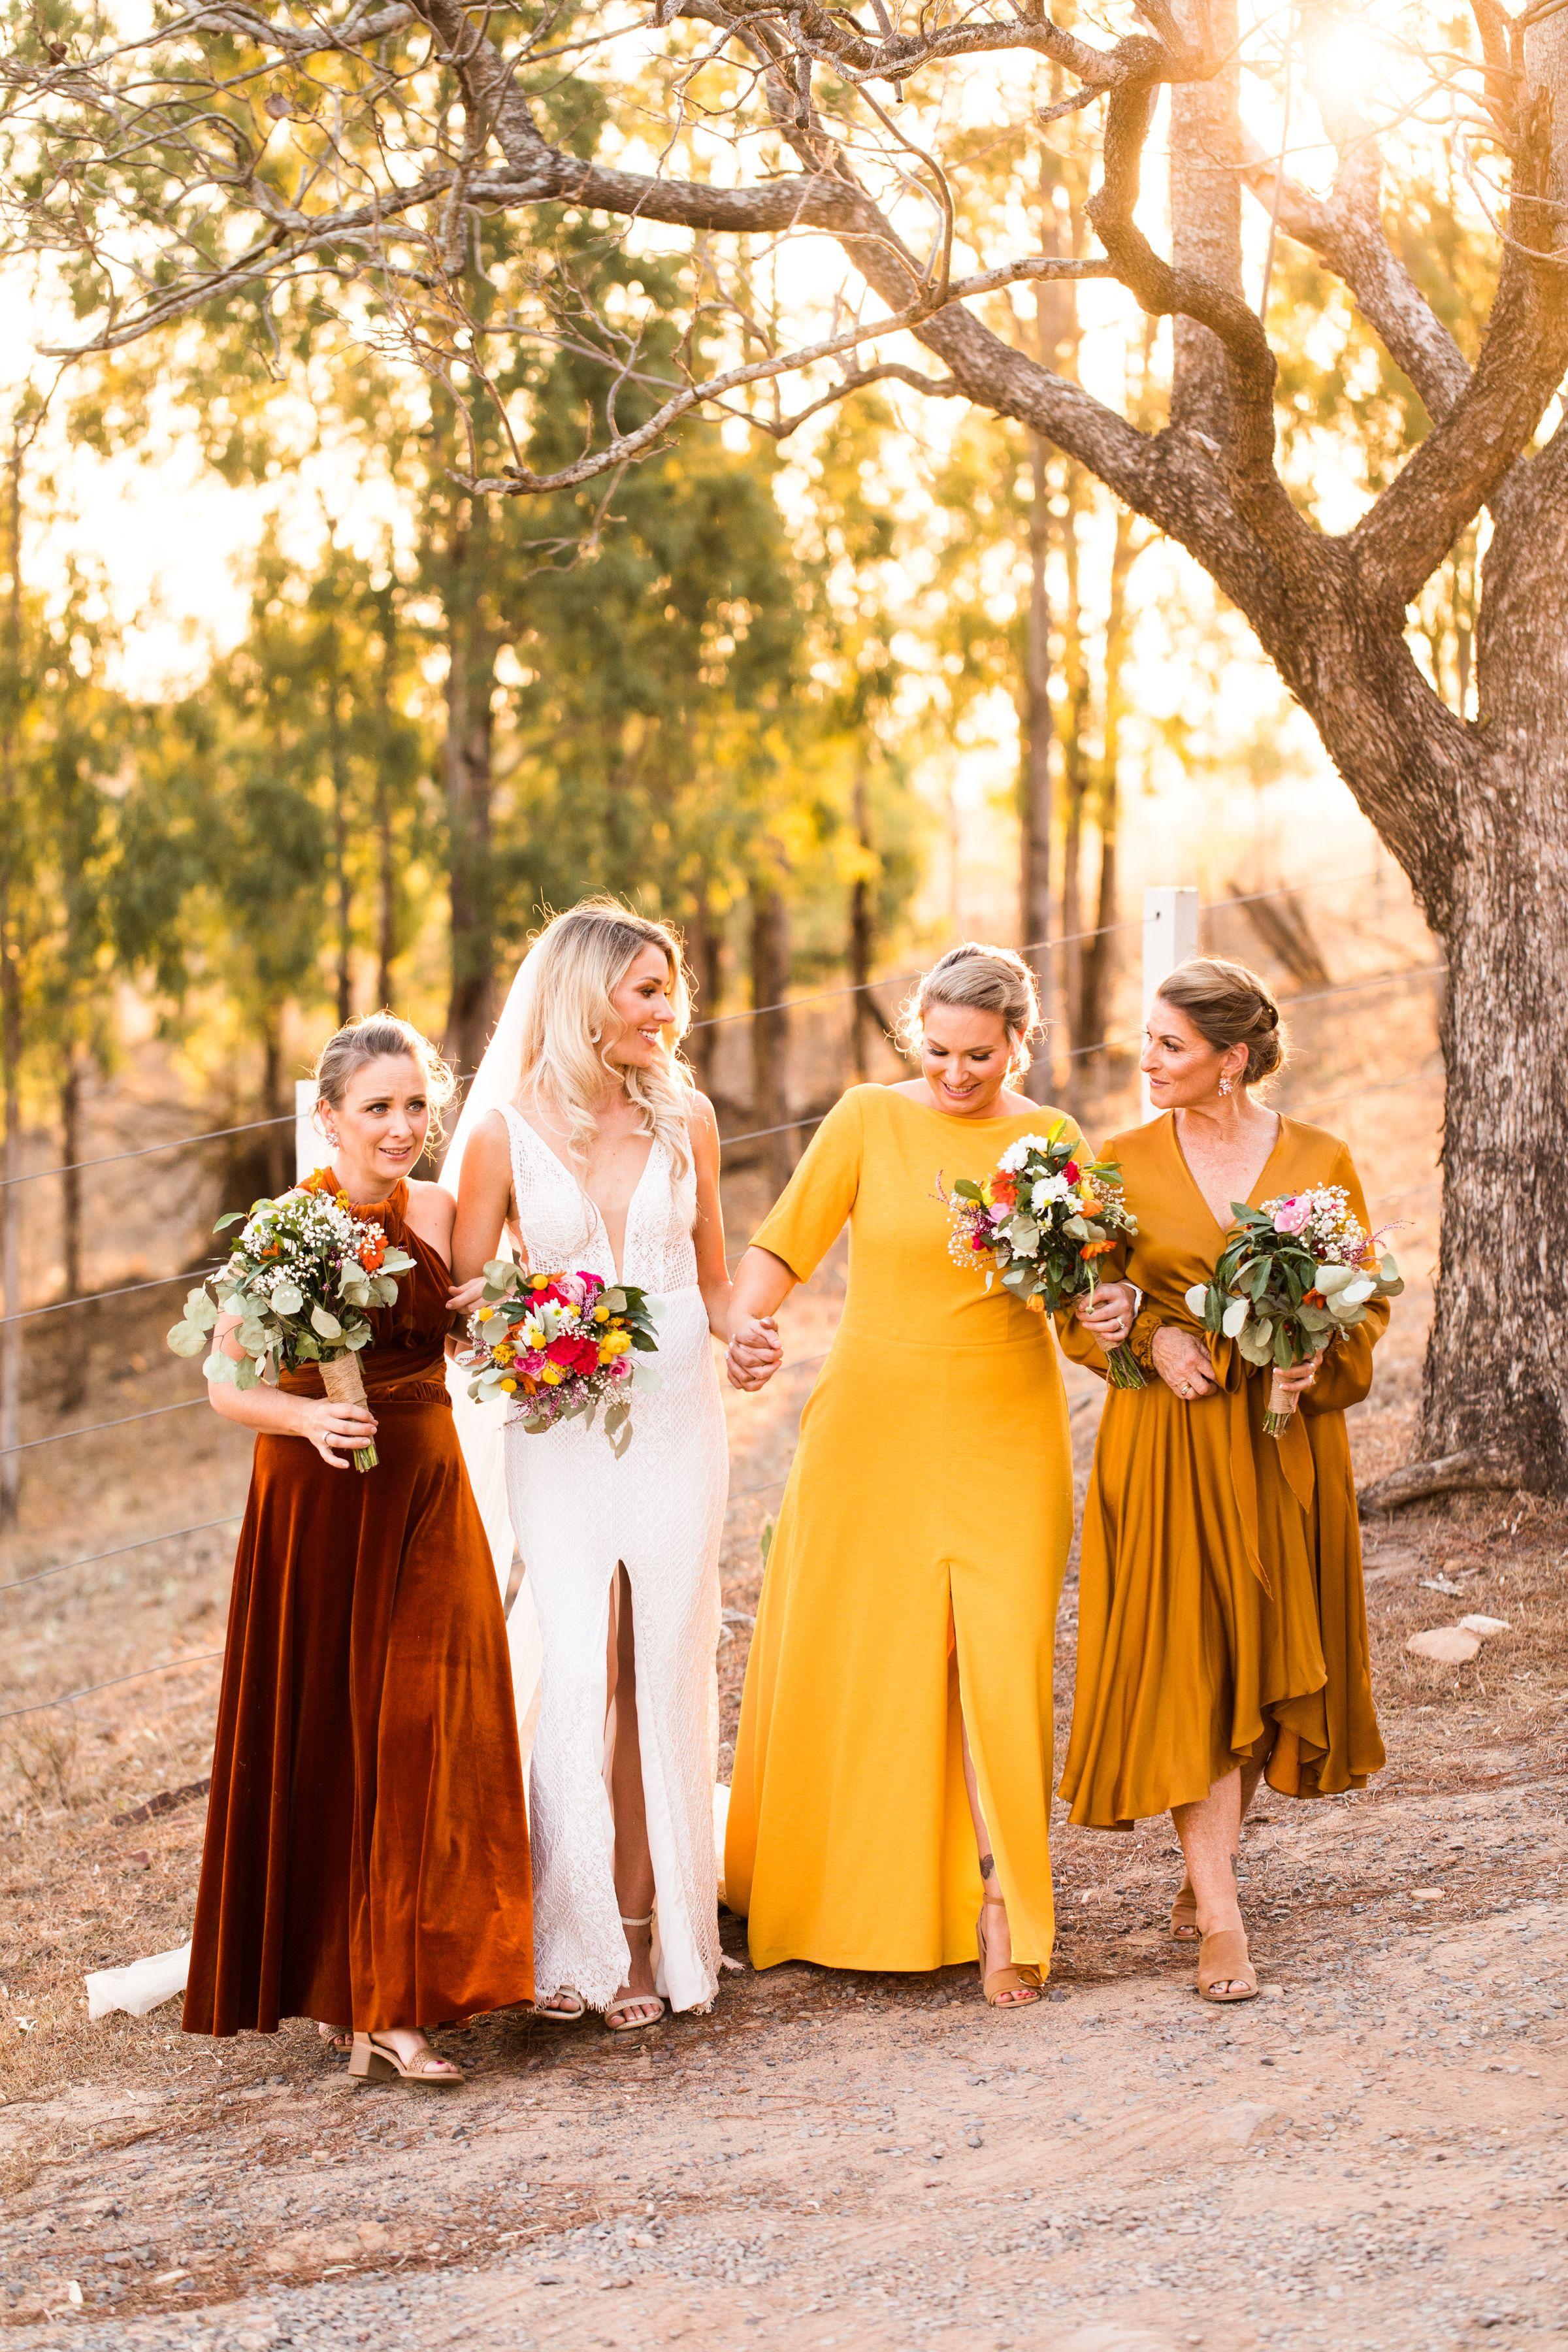 Bridesmaid Mismatch Dresses Burnt Orange Mustard And Gold Mustard Bridesmaid Dresses Orange Bridesmaid Dresses Burnt Orange Bridesmaid Dresses [ 3600 x 2400 Pixel ]